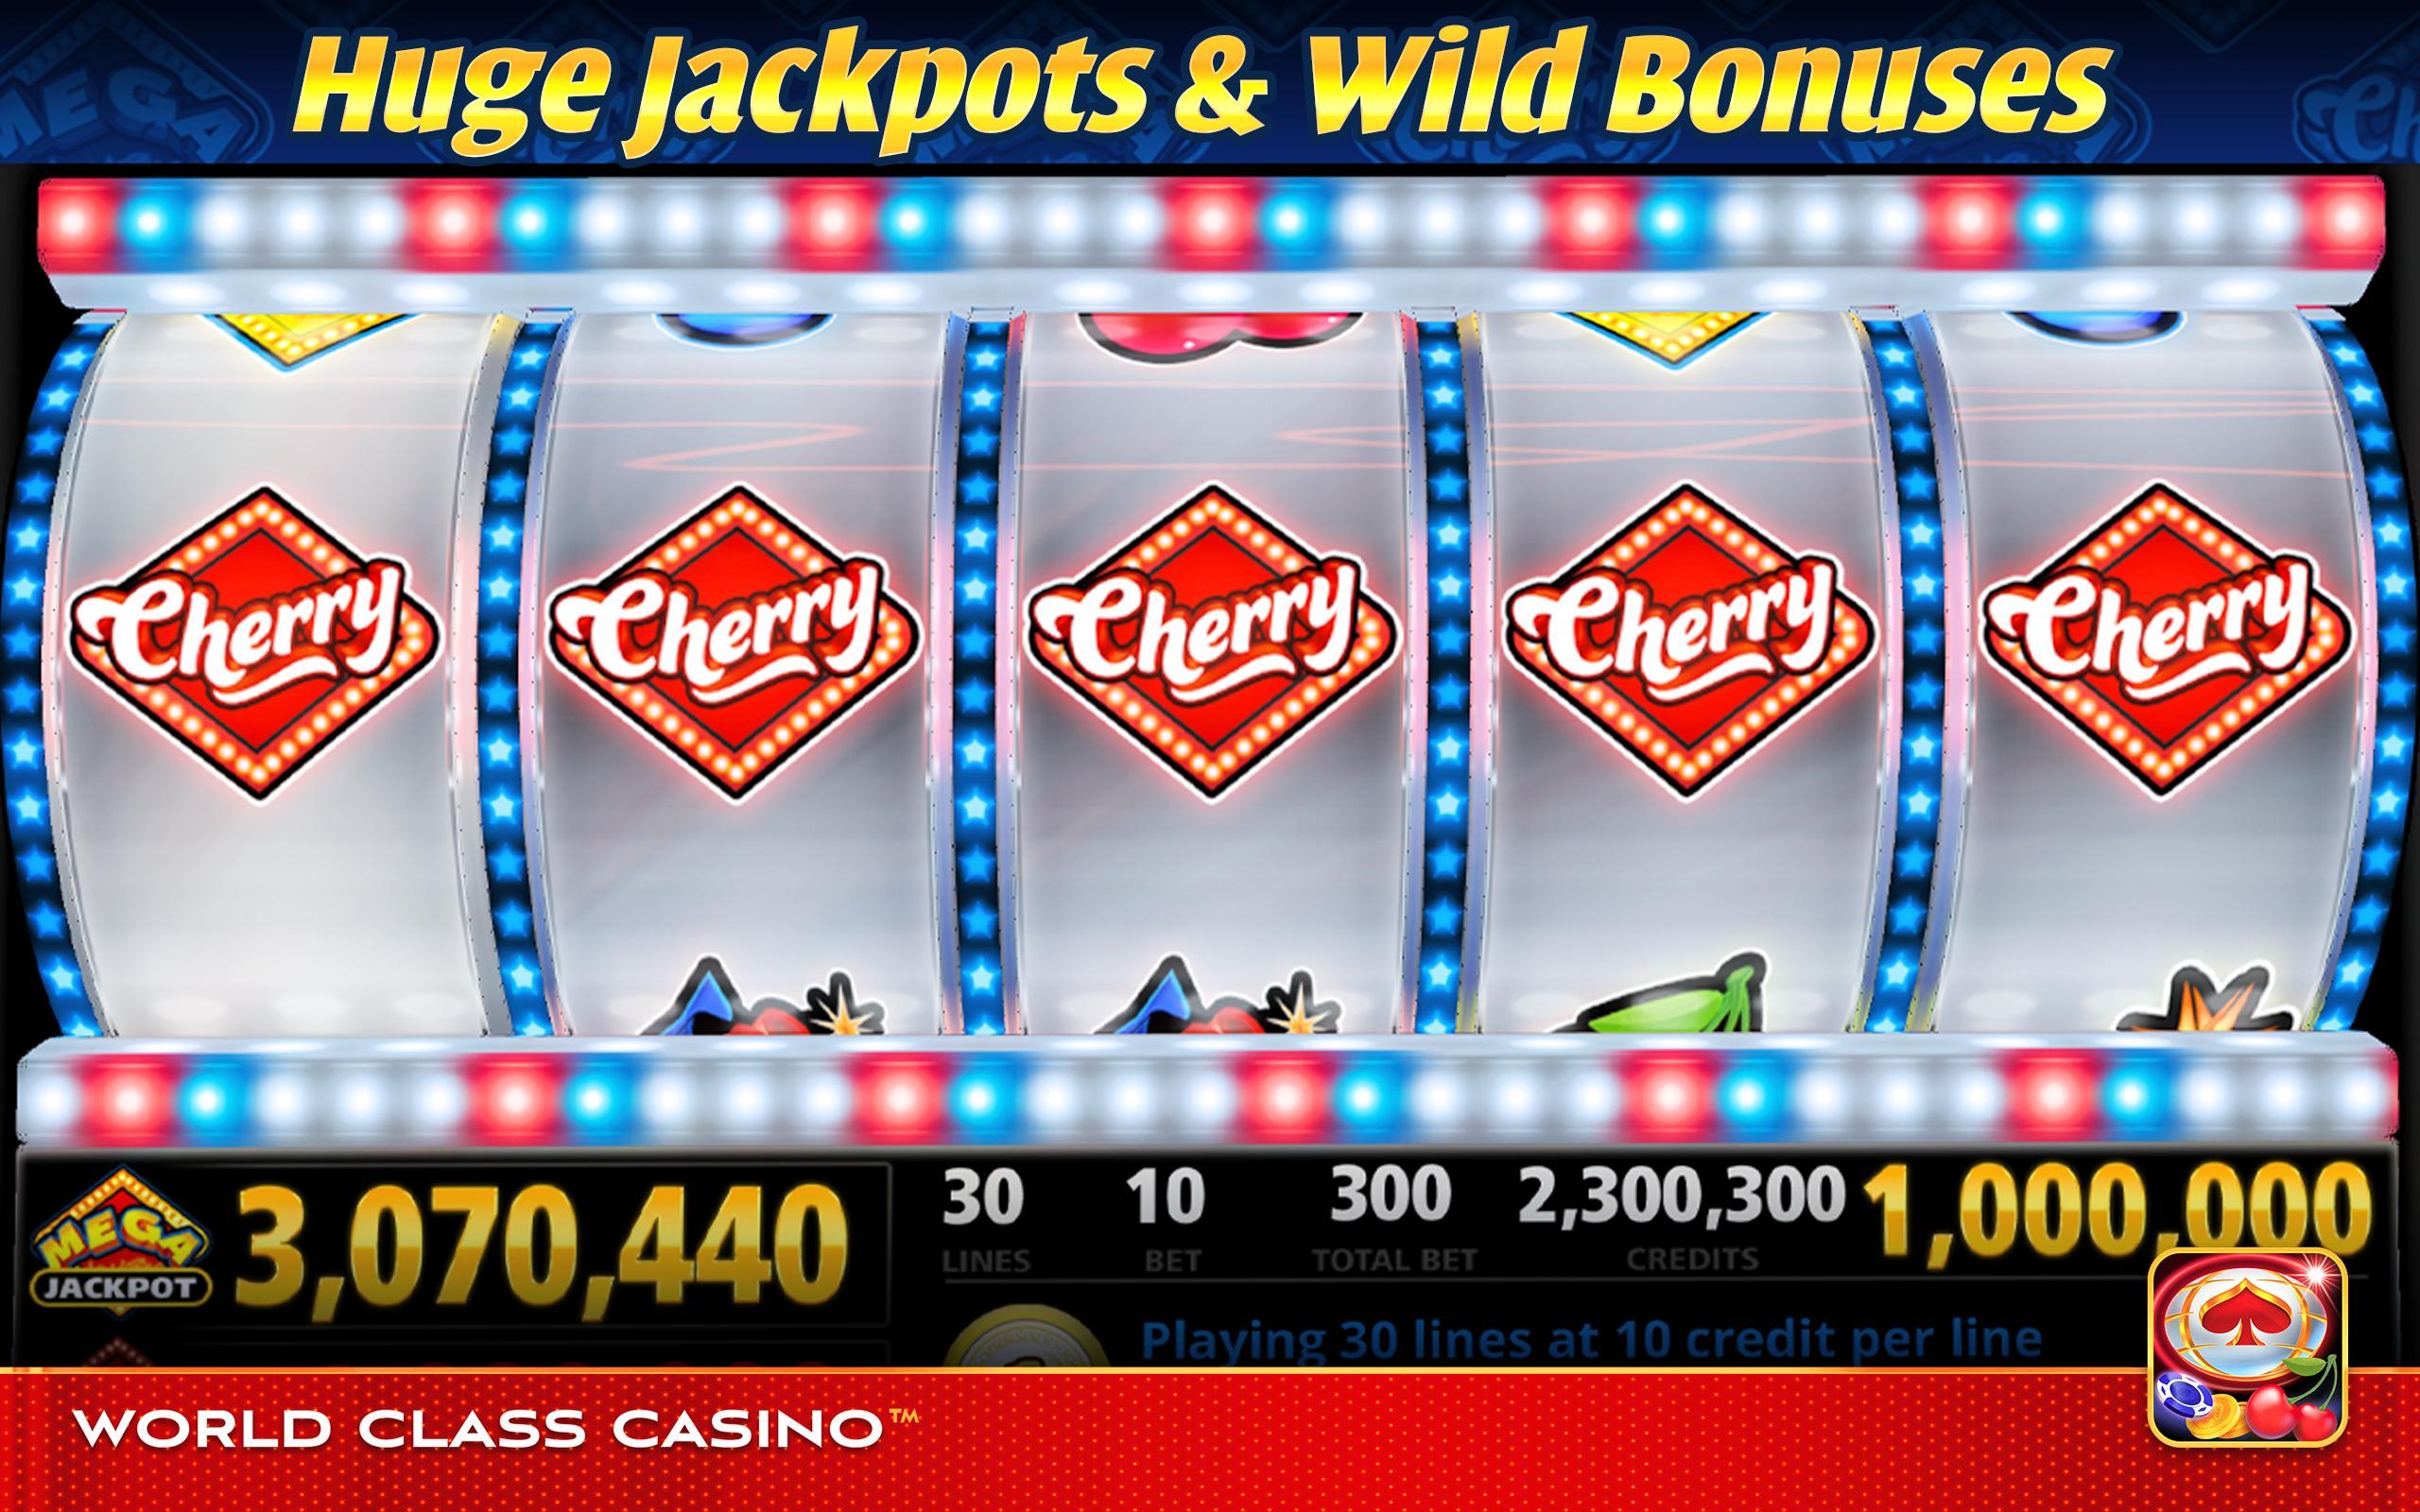 World Class Casino Slots, Blackjack & Poker Room 8.0.4 Screenshot 8